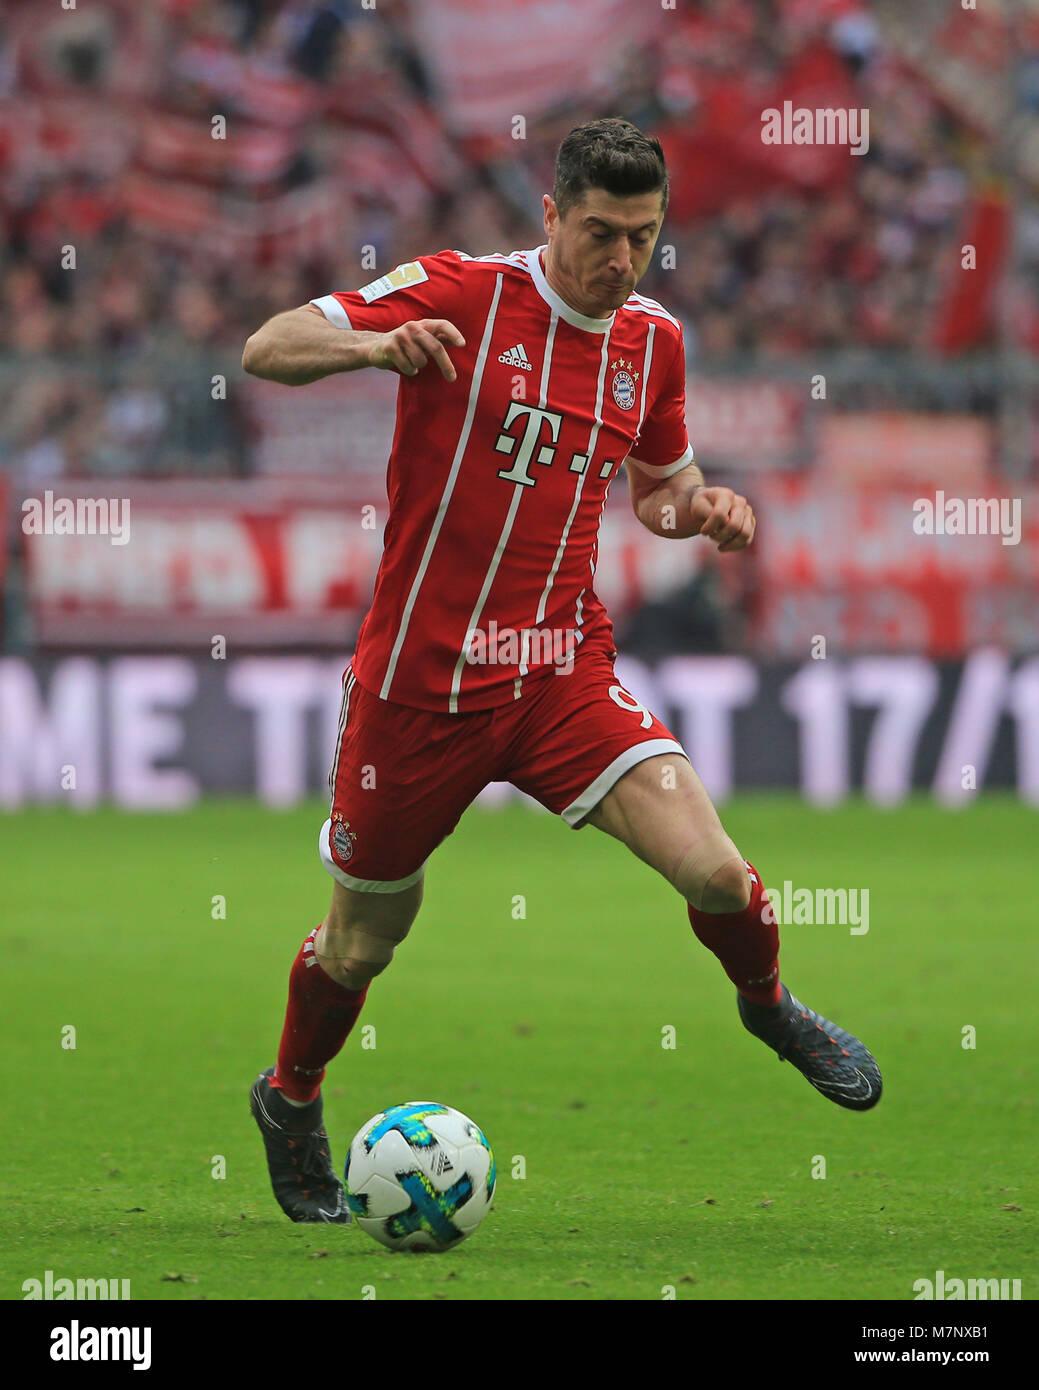 20180310, Football, 1. Bundesliga, 26.Matchday, at Allianz Arena Munich, FC Bayern vs Hamburg SV, Fussball, Sport, - Stock Image